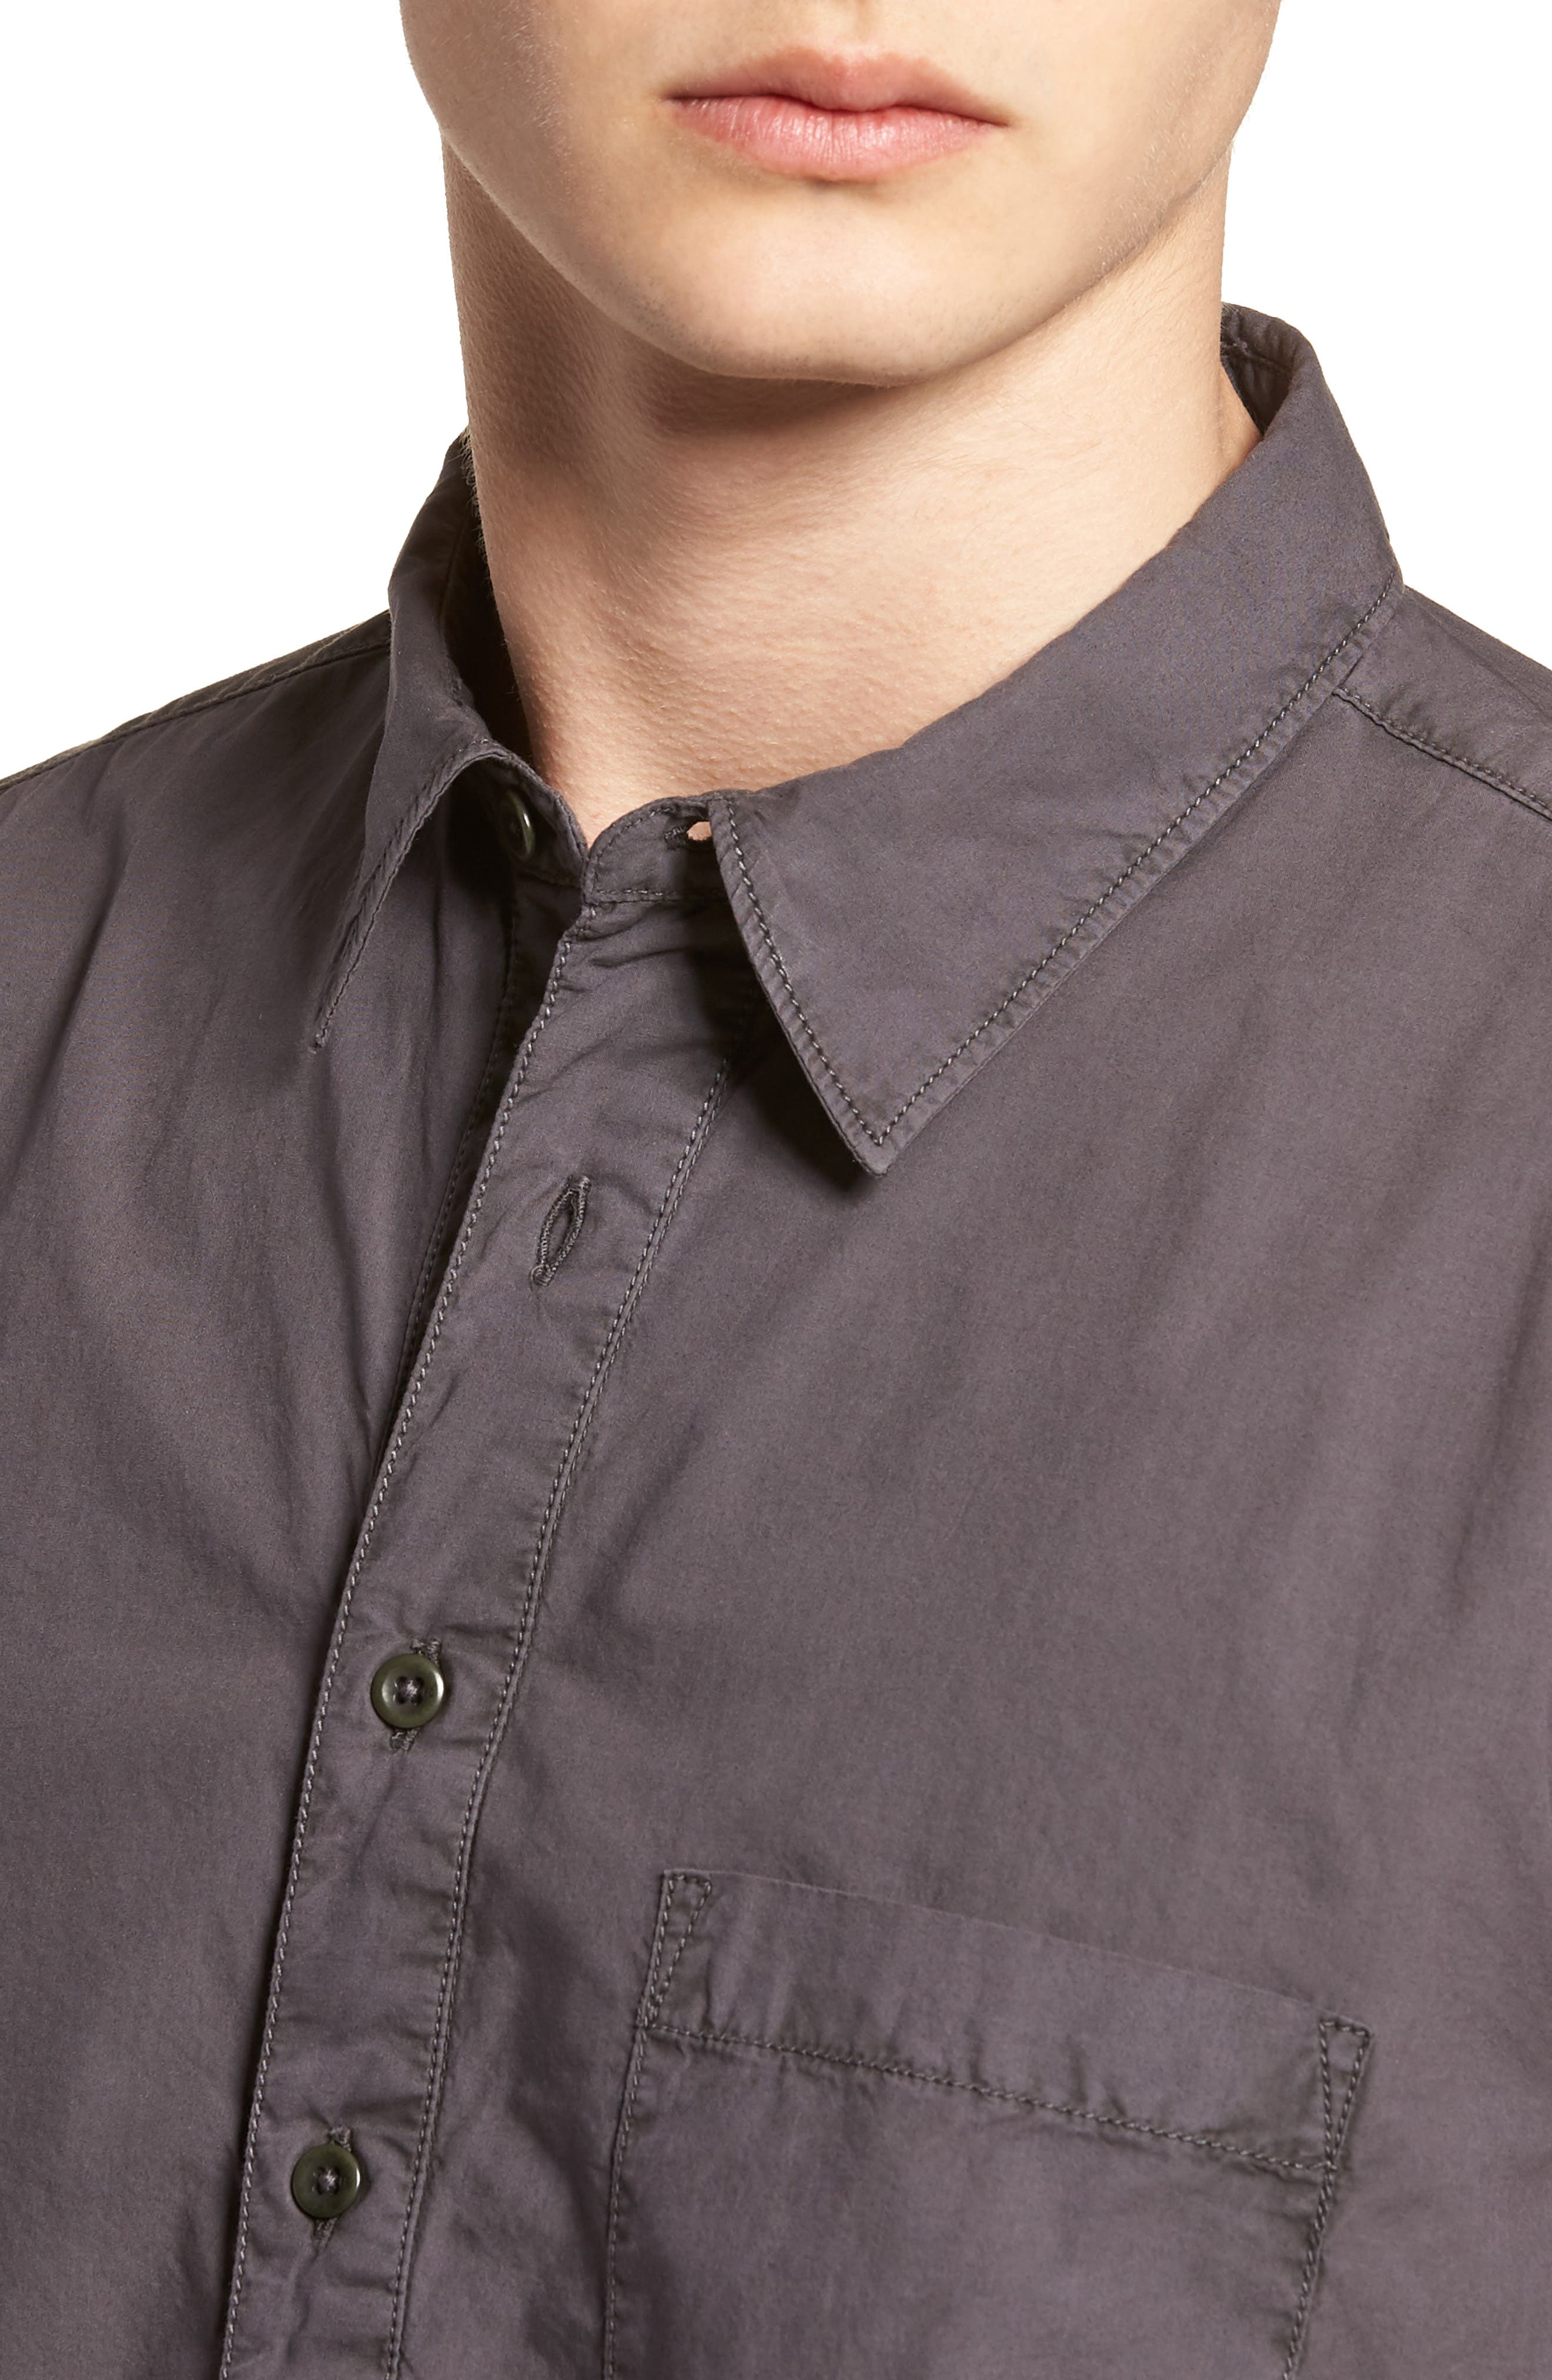 Regular Fit Garment Dyed Poplin Sport Shirt,                             Alternate thumbnail 4, color,                             Workwear Grey